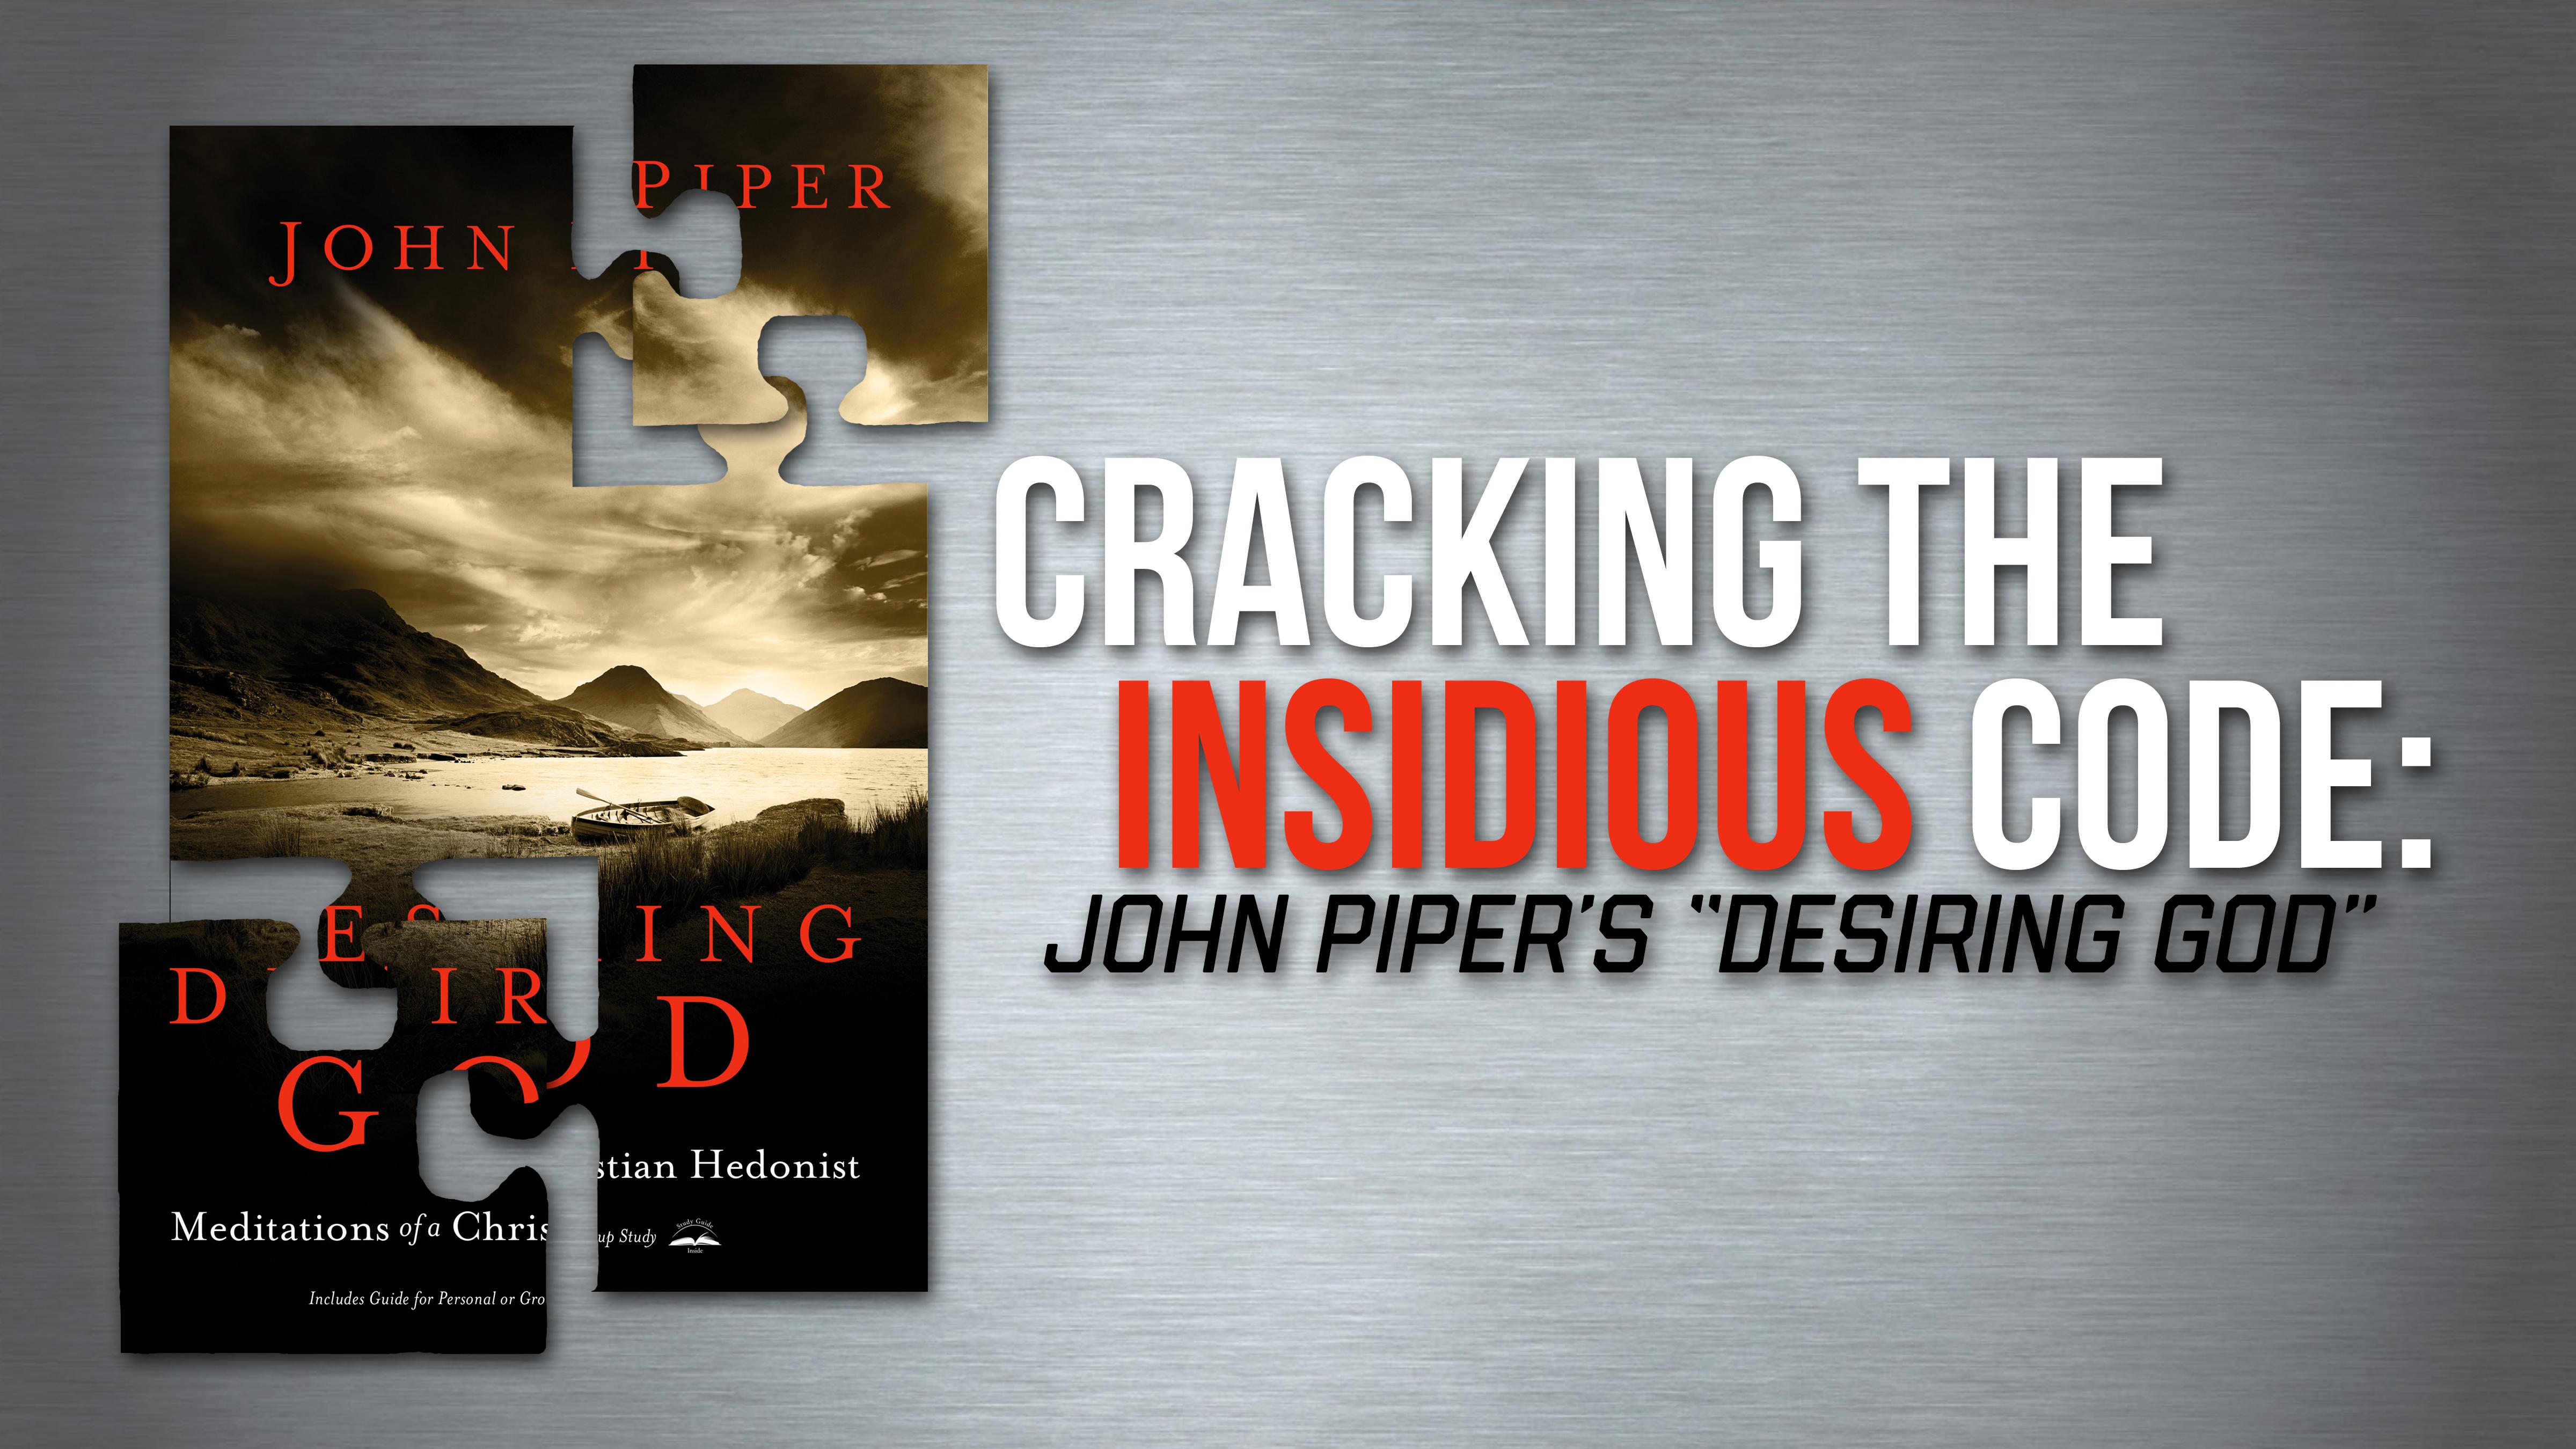 Cracking the Insidious Code Part II: A Closer Look at John